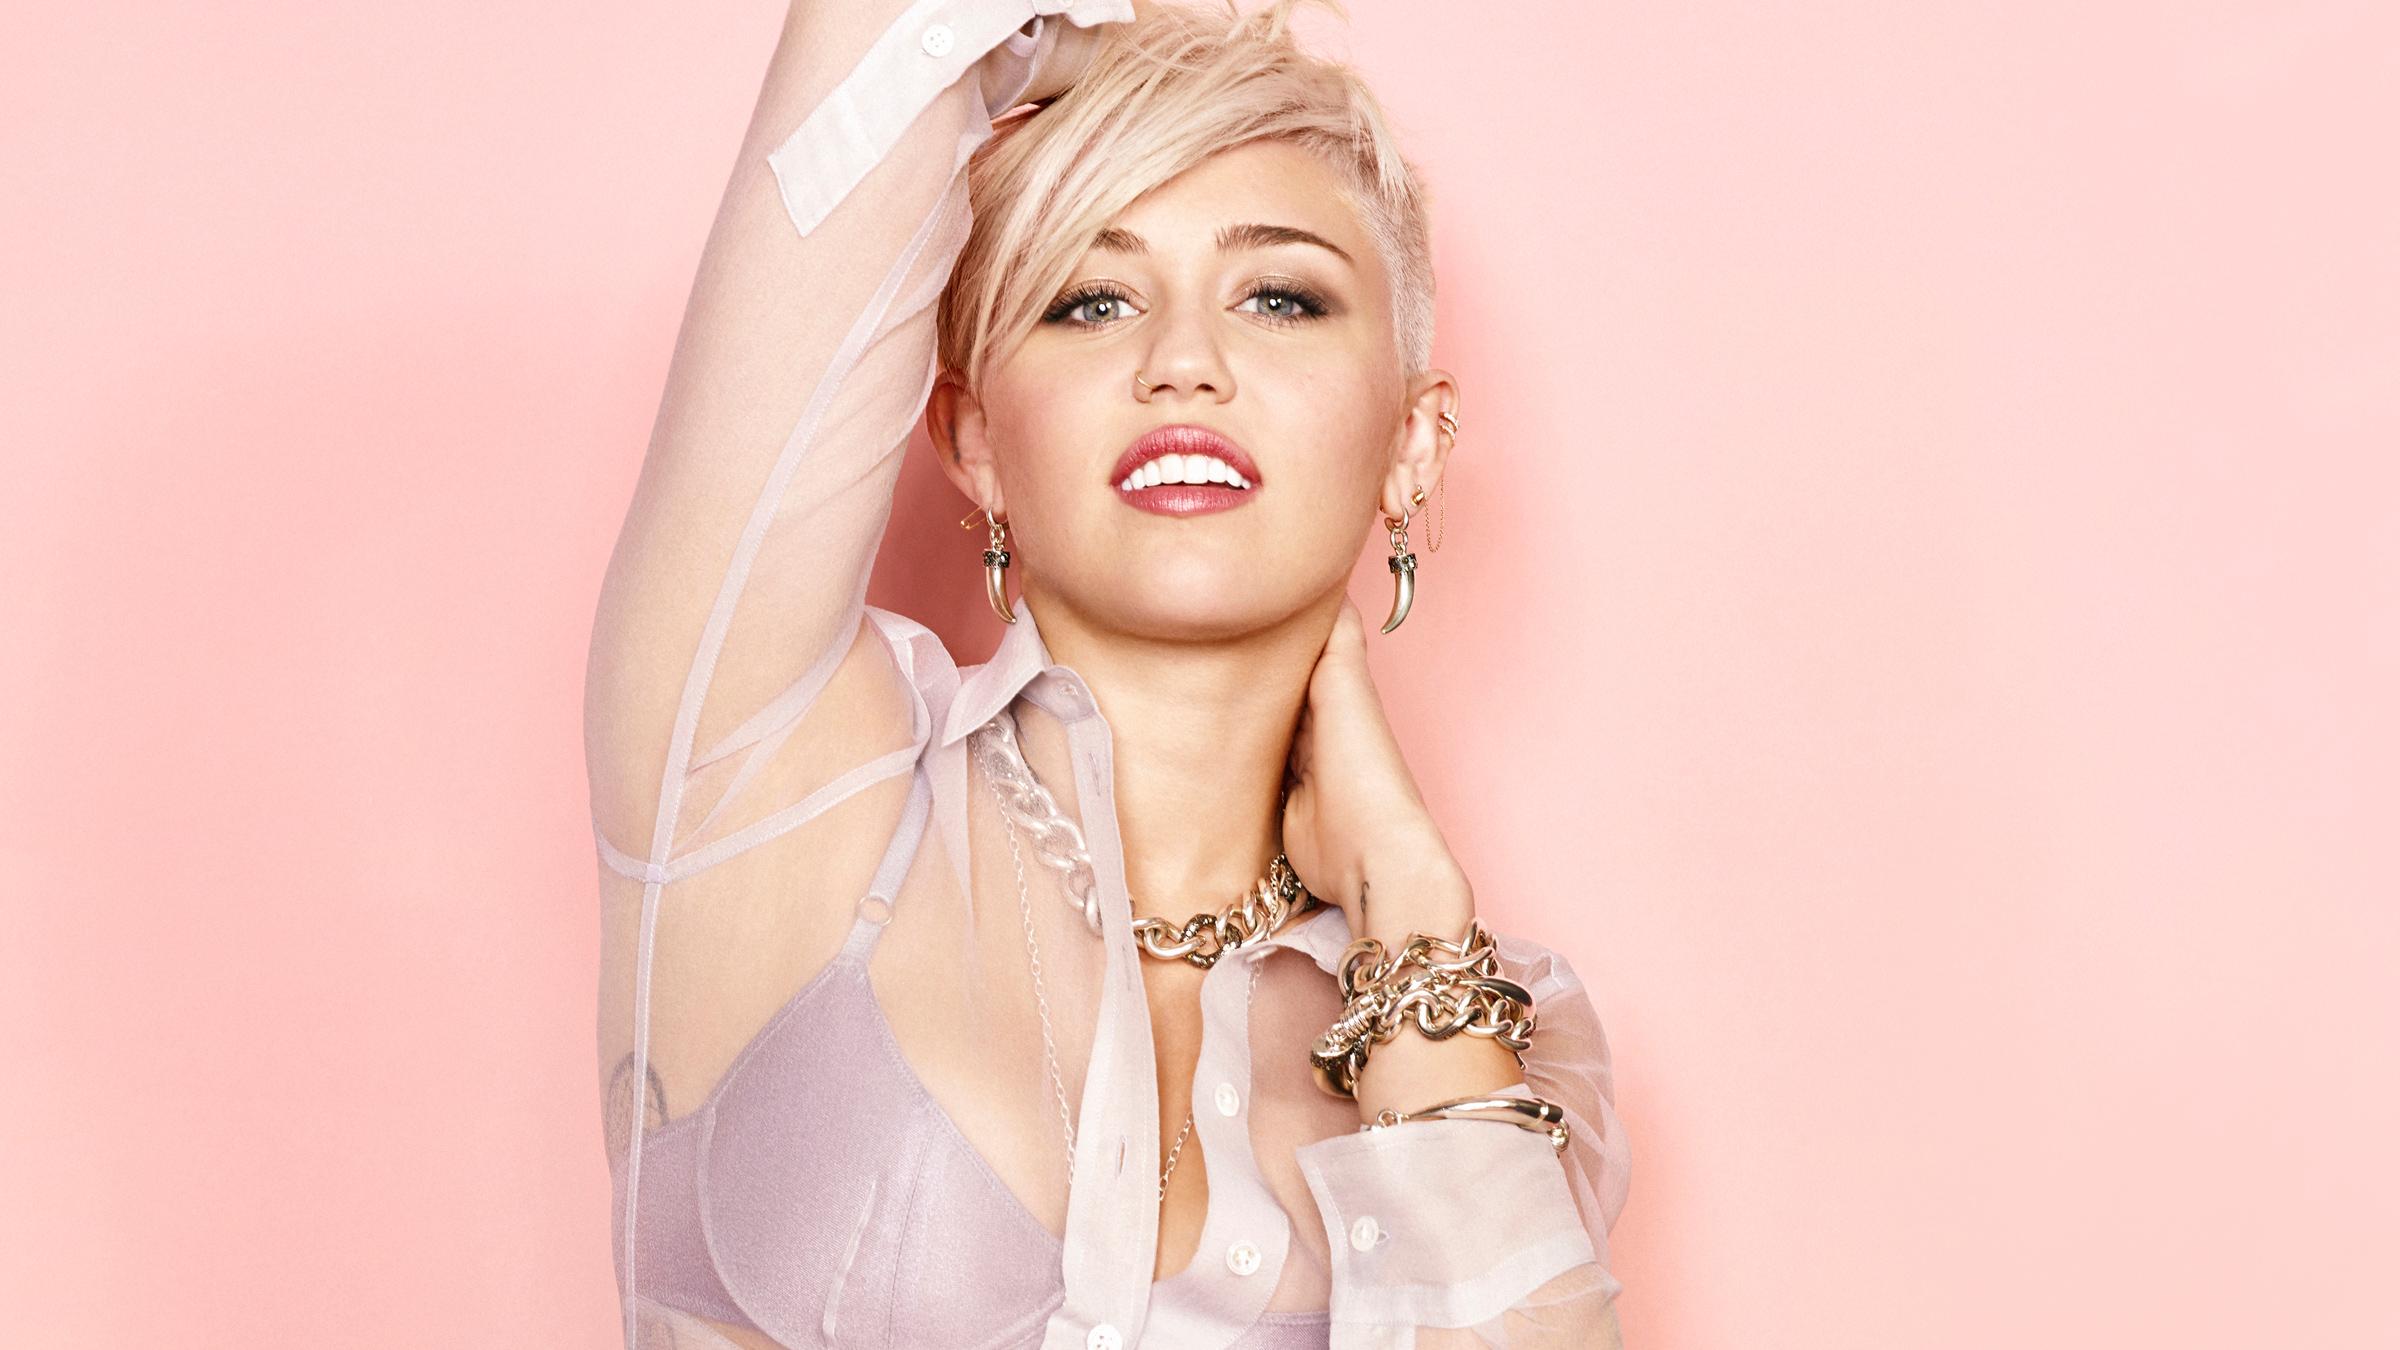 Miley Cyrus | Miley cyrus pictures, Miley cyrus, Celebrities